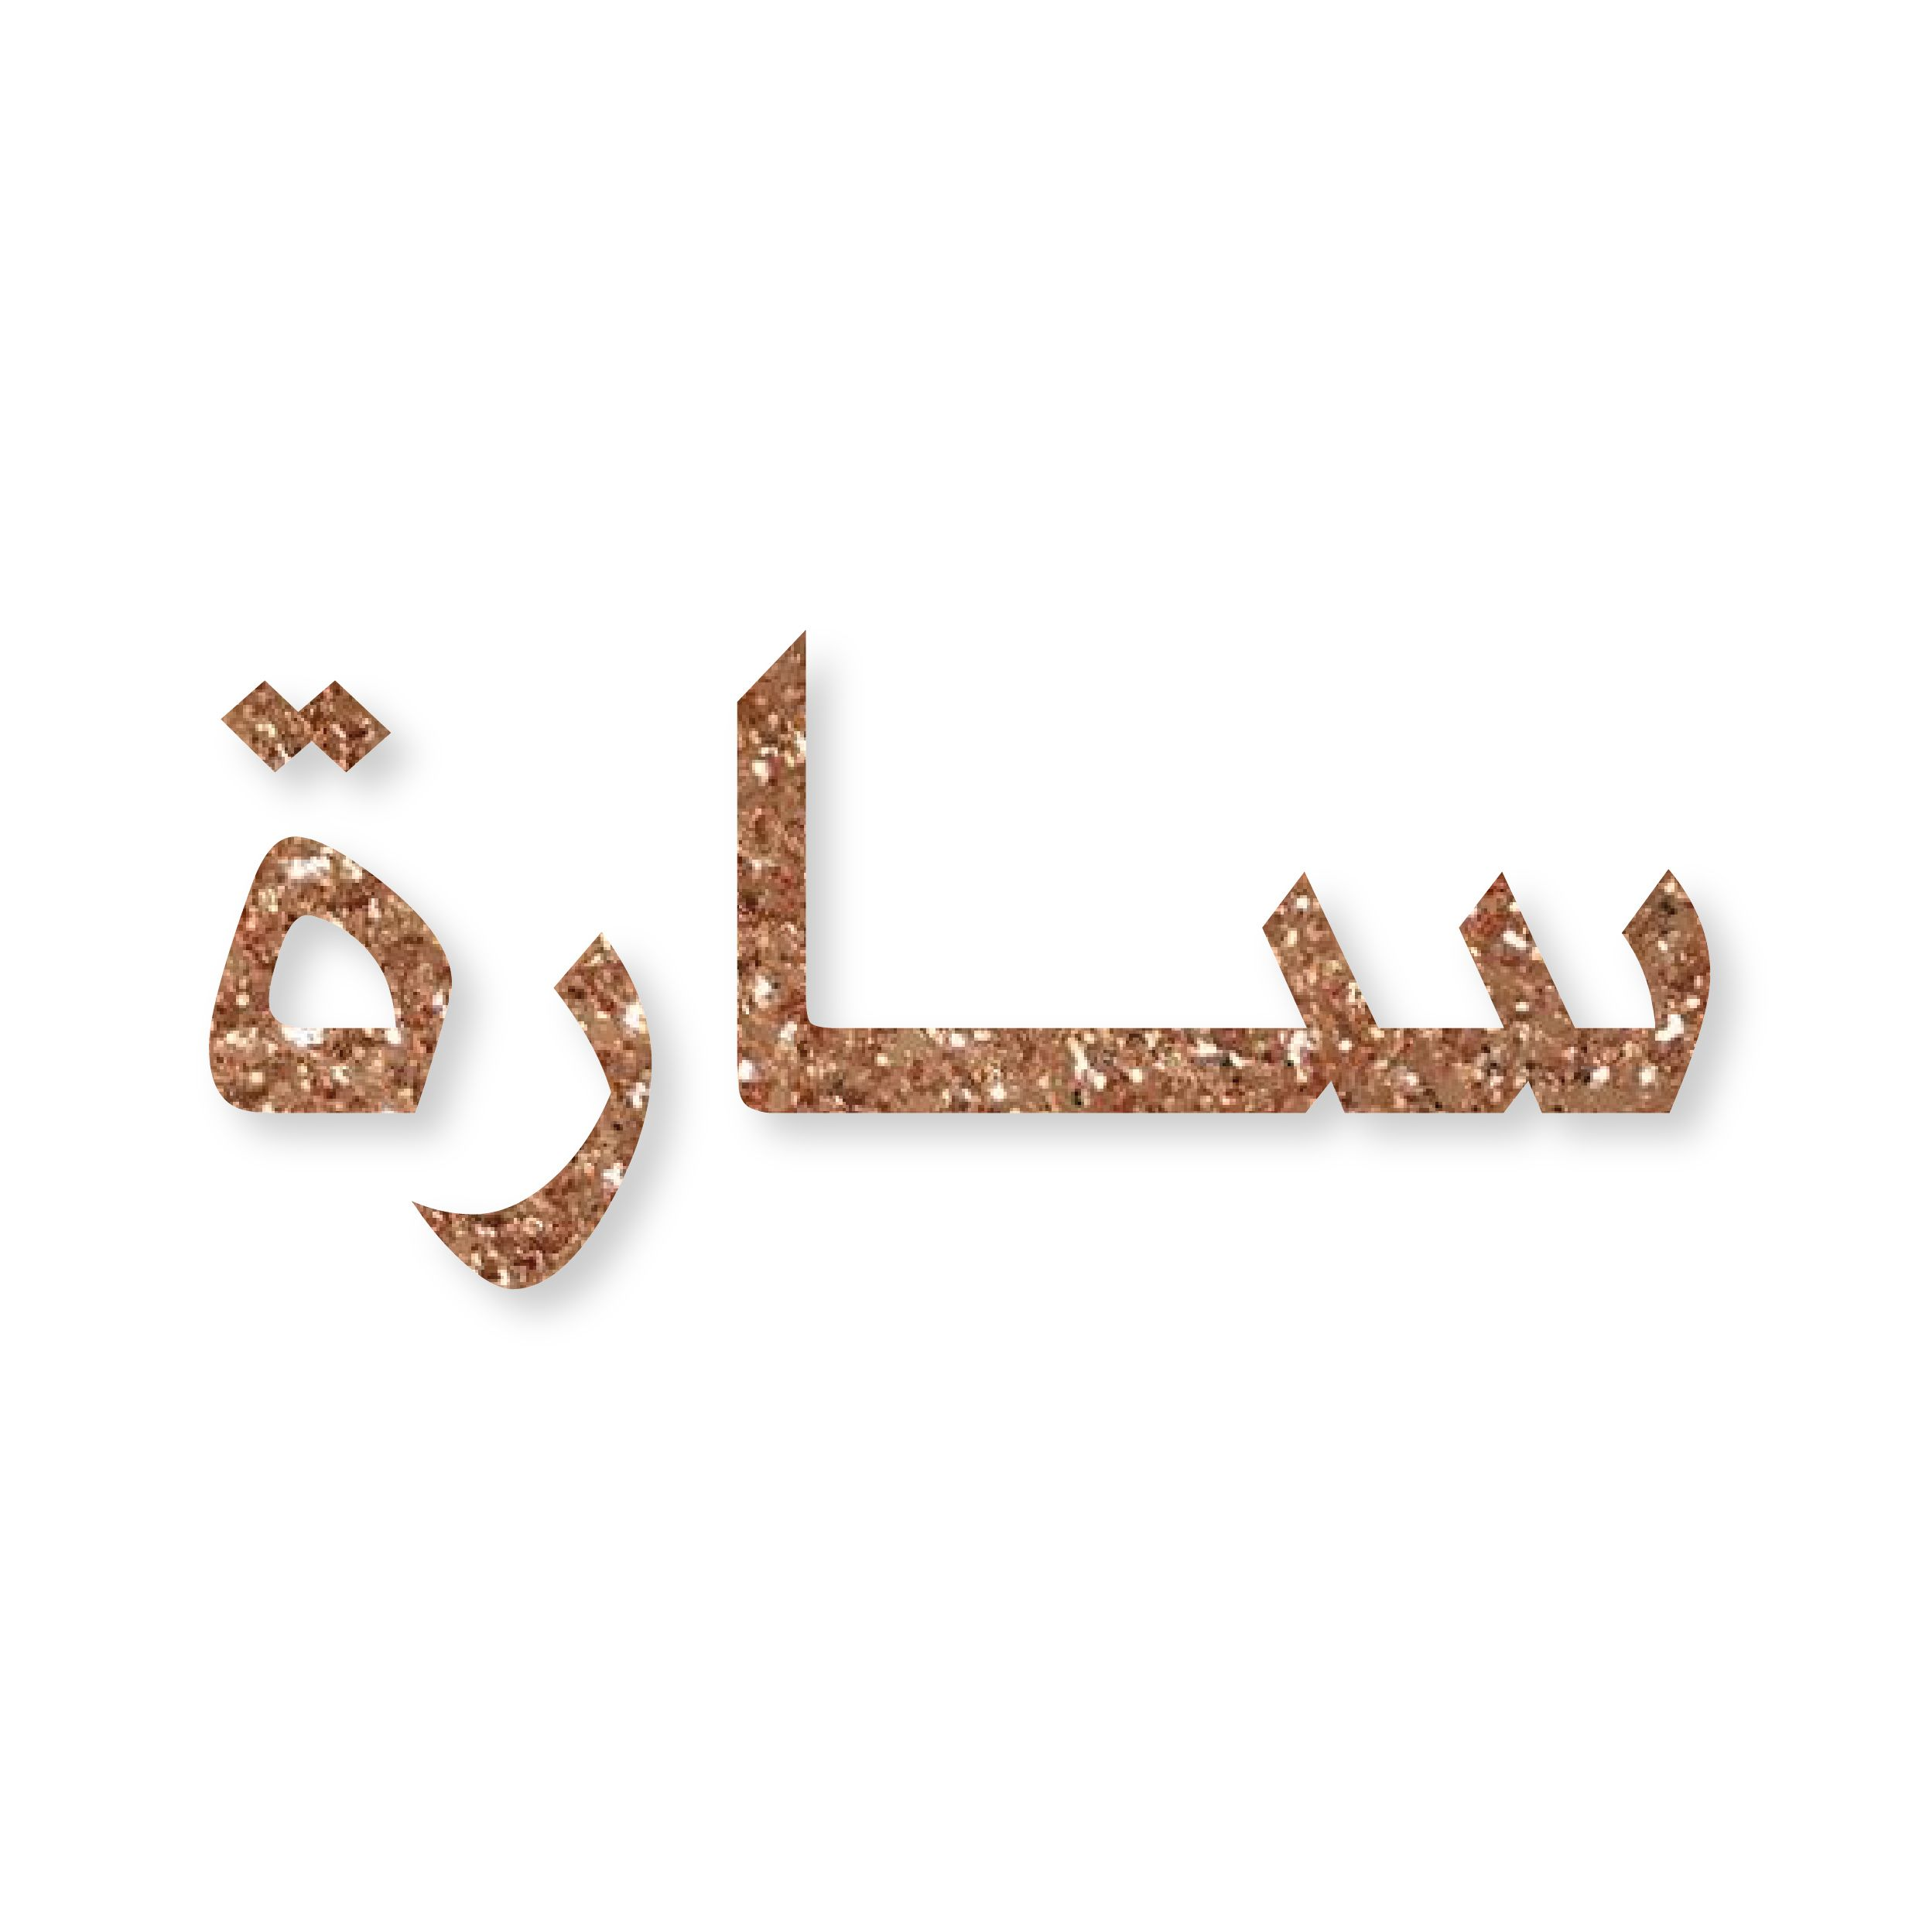 Arabic Typography Sara Sarah Ex Quotes Crown Jewelry Jewelry